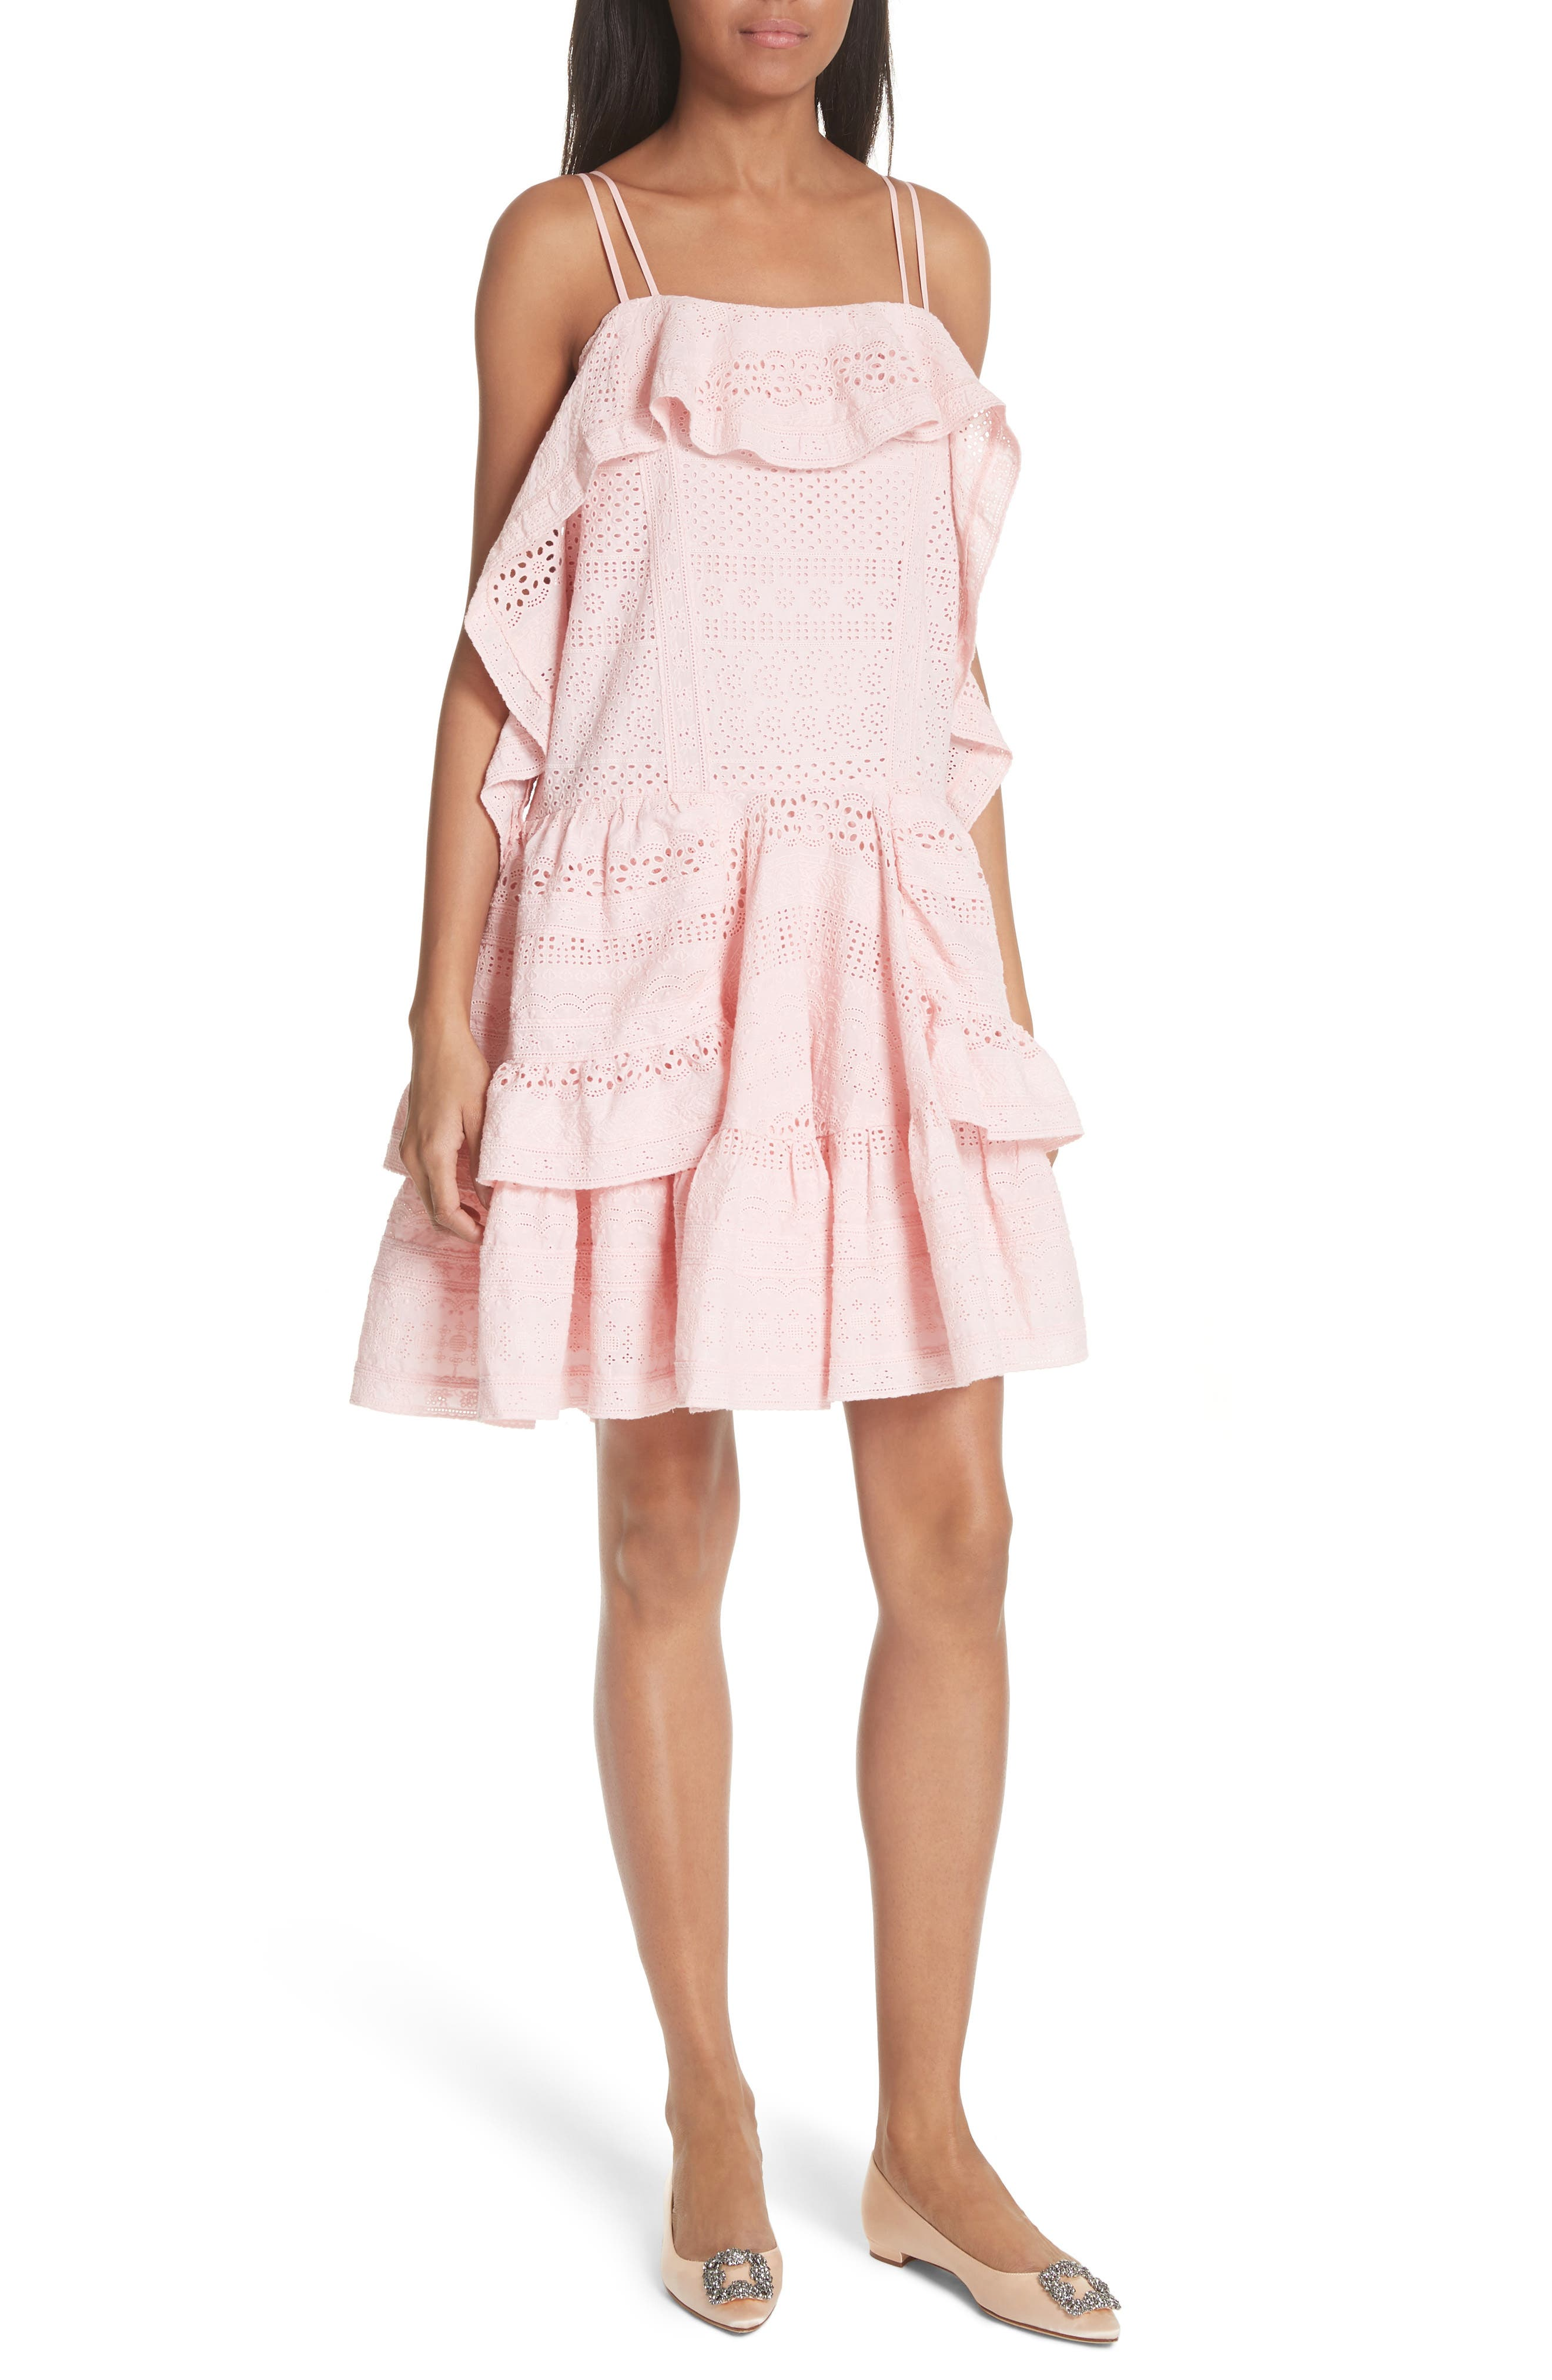 Periwinkle Knee Length Dress